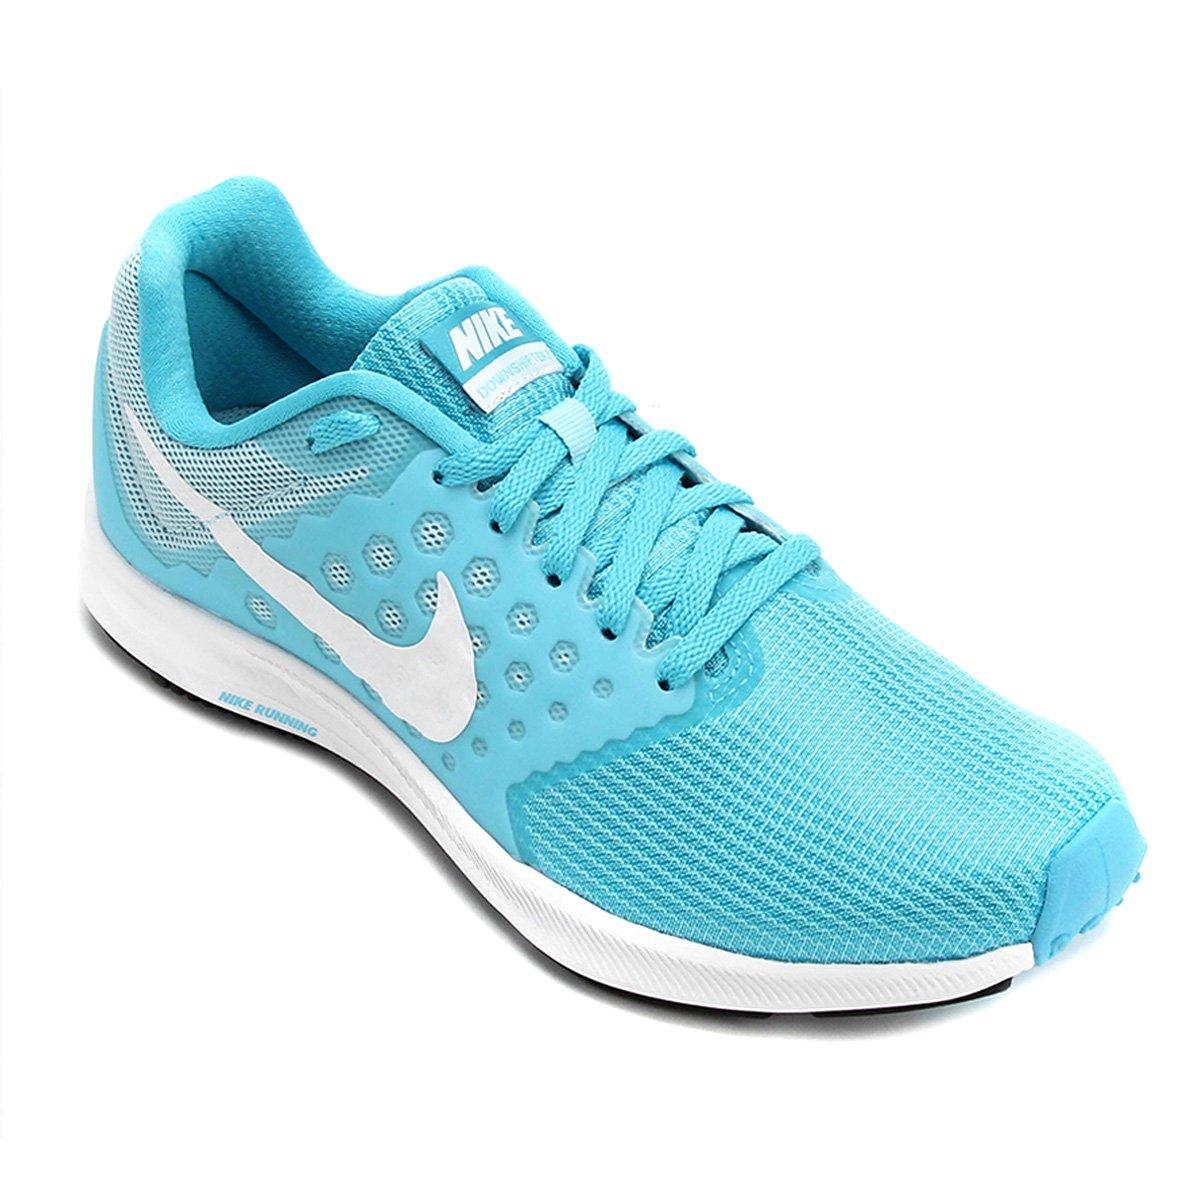 Tênis Nike Downshifter 7 Feminino Azul E Branco